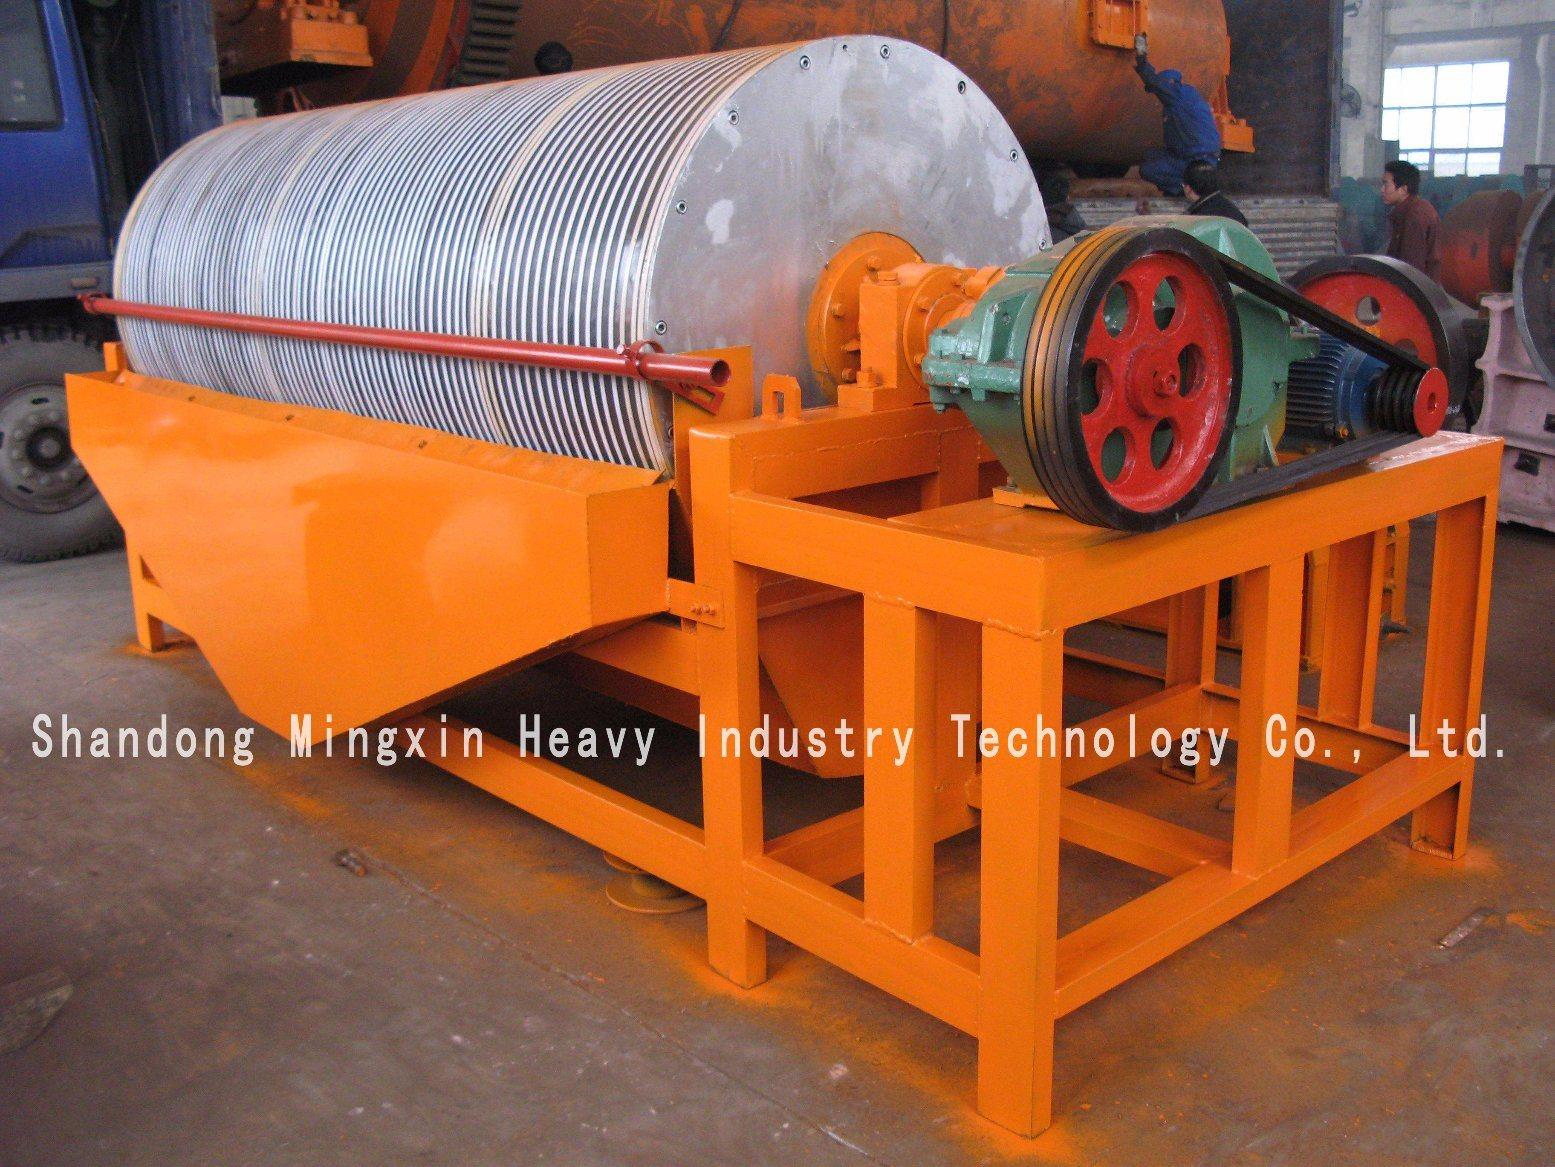 Dry Magnetic Separator 7000 Gauss for Gold Washing Machine